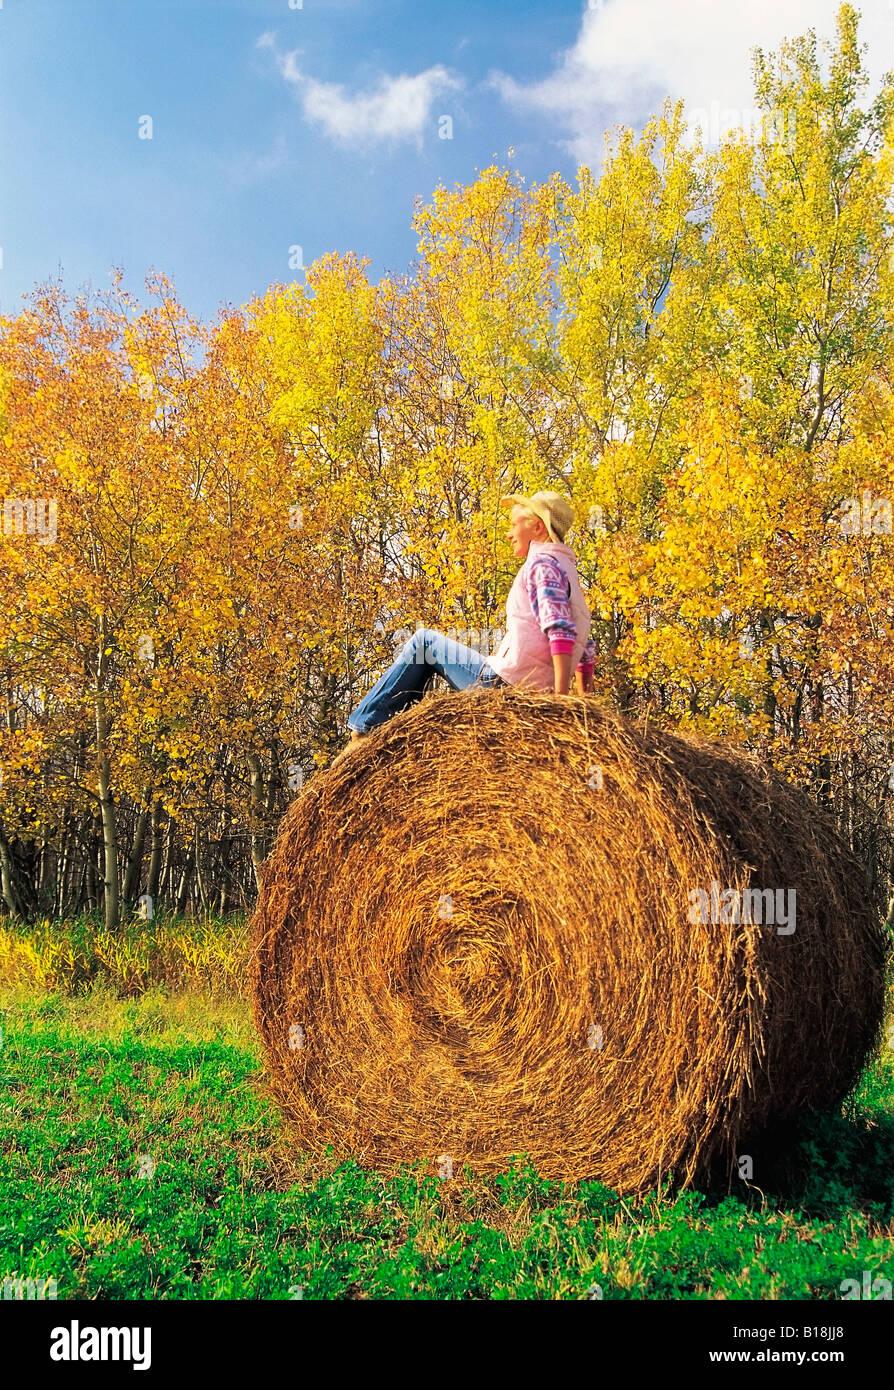 17 year old girl on alfalfa roll, near Winnipeg, Manitoba, Canada - Stock Image